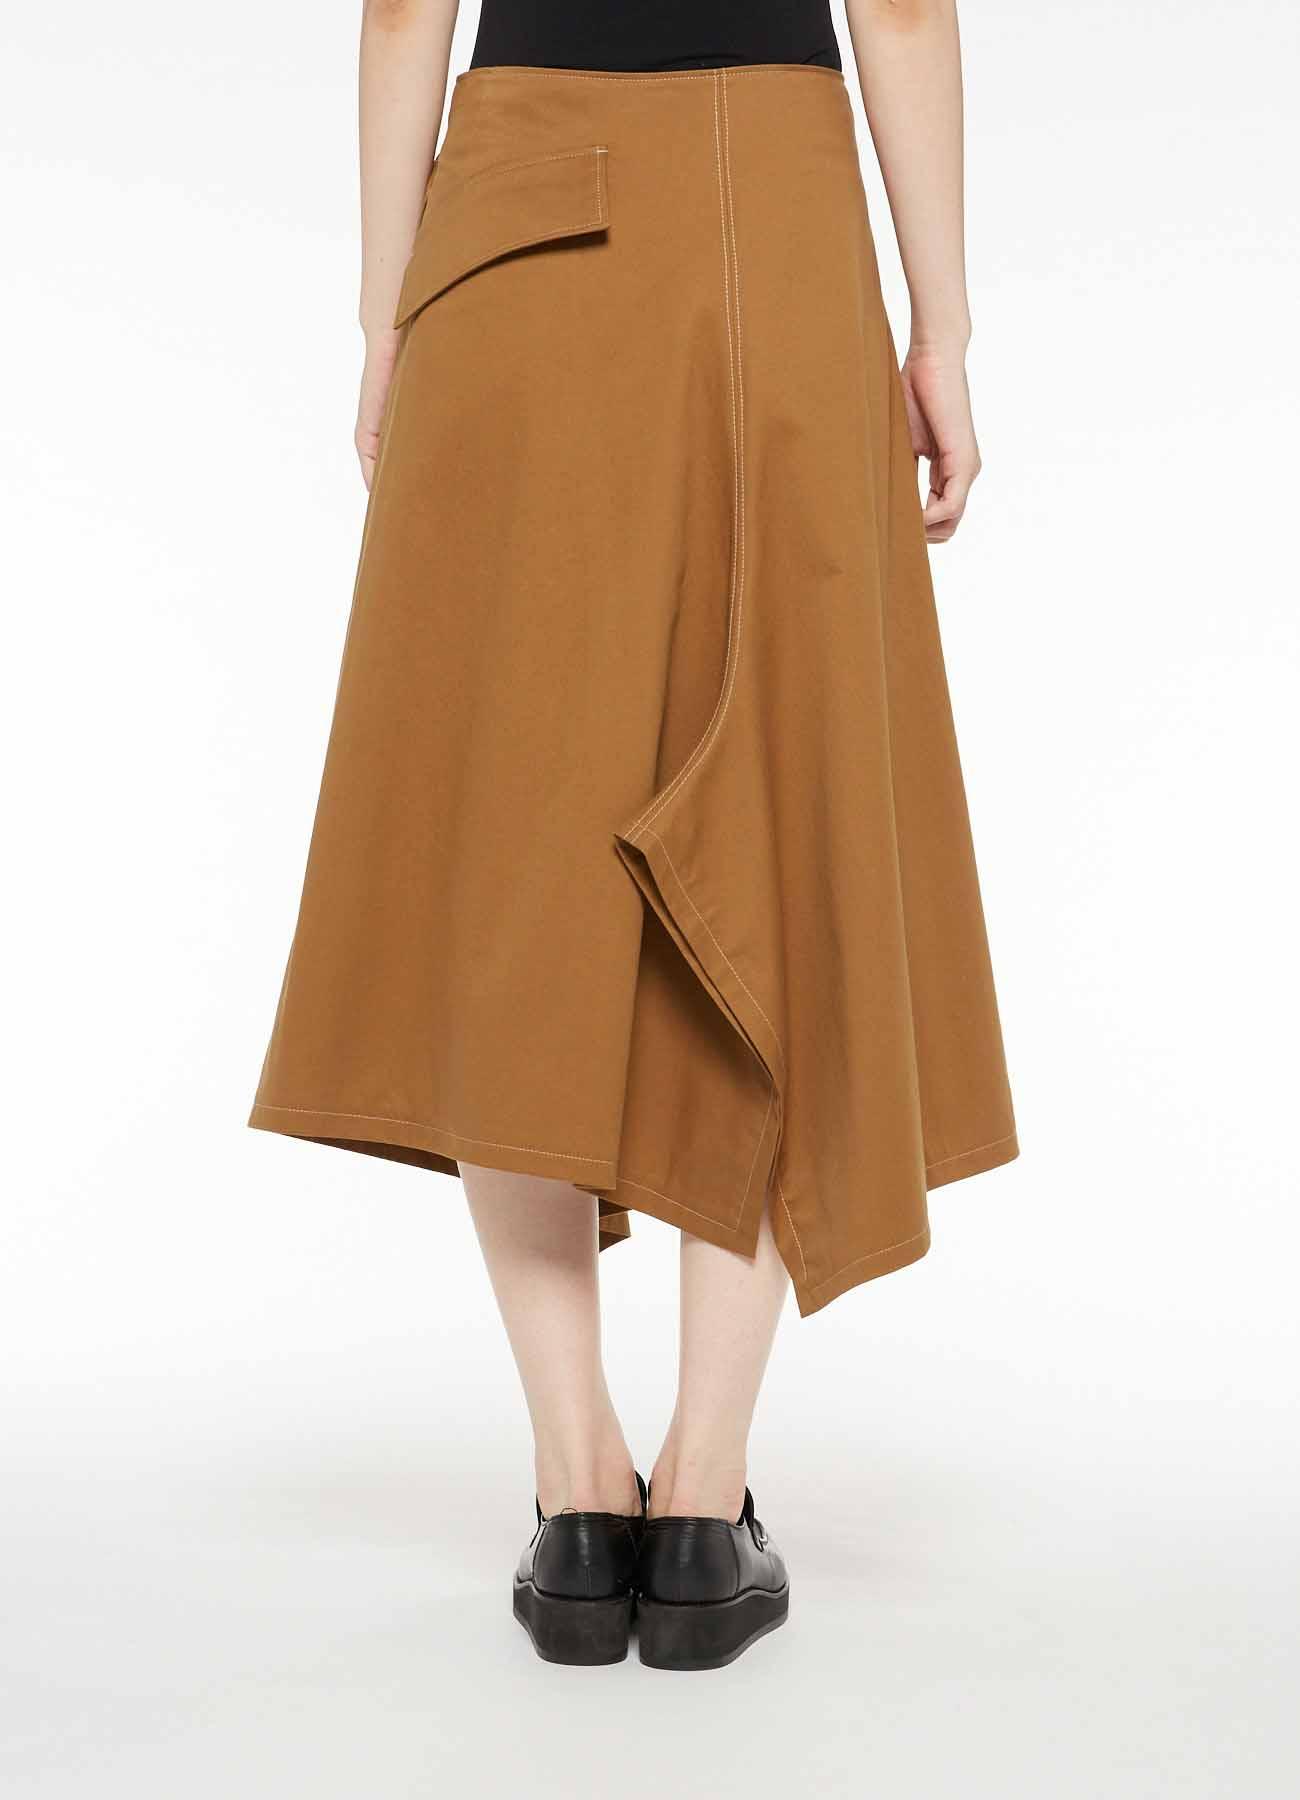 SOFT CHINO CLOTH ASYMMETRICAL LEFT BELT SKIRT